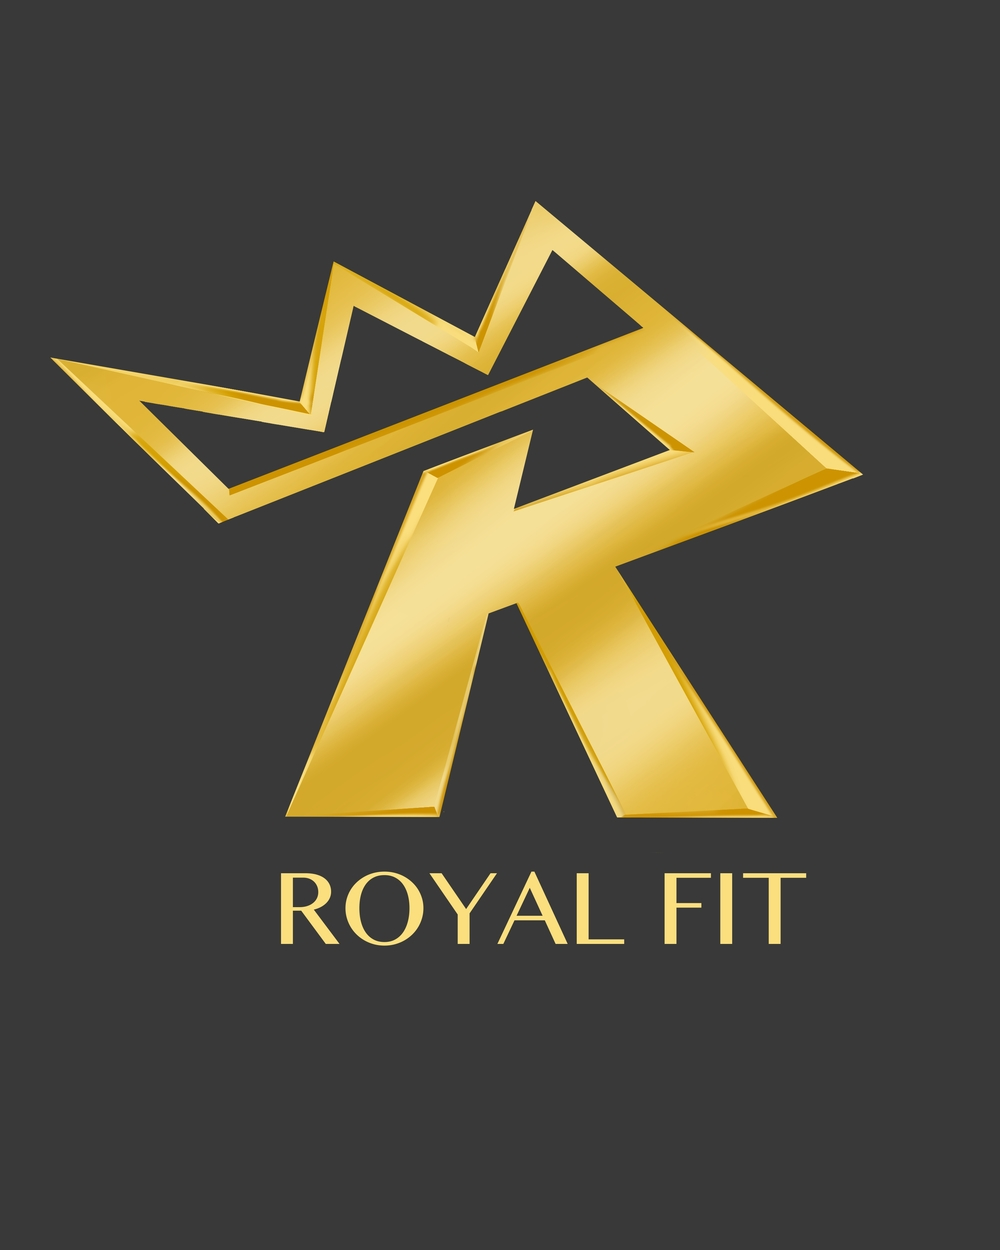 royalfitfinal.jpg